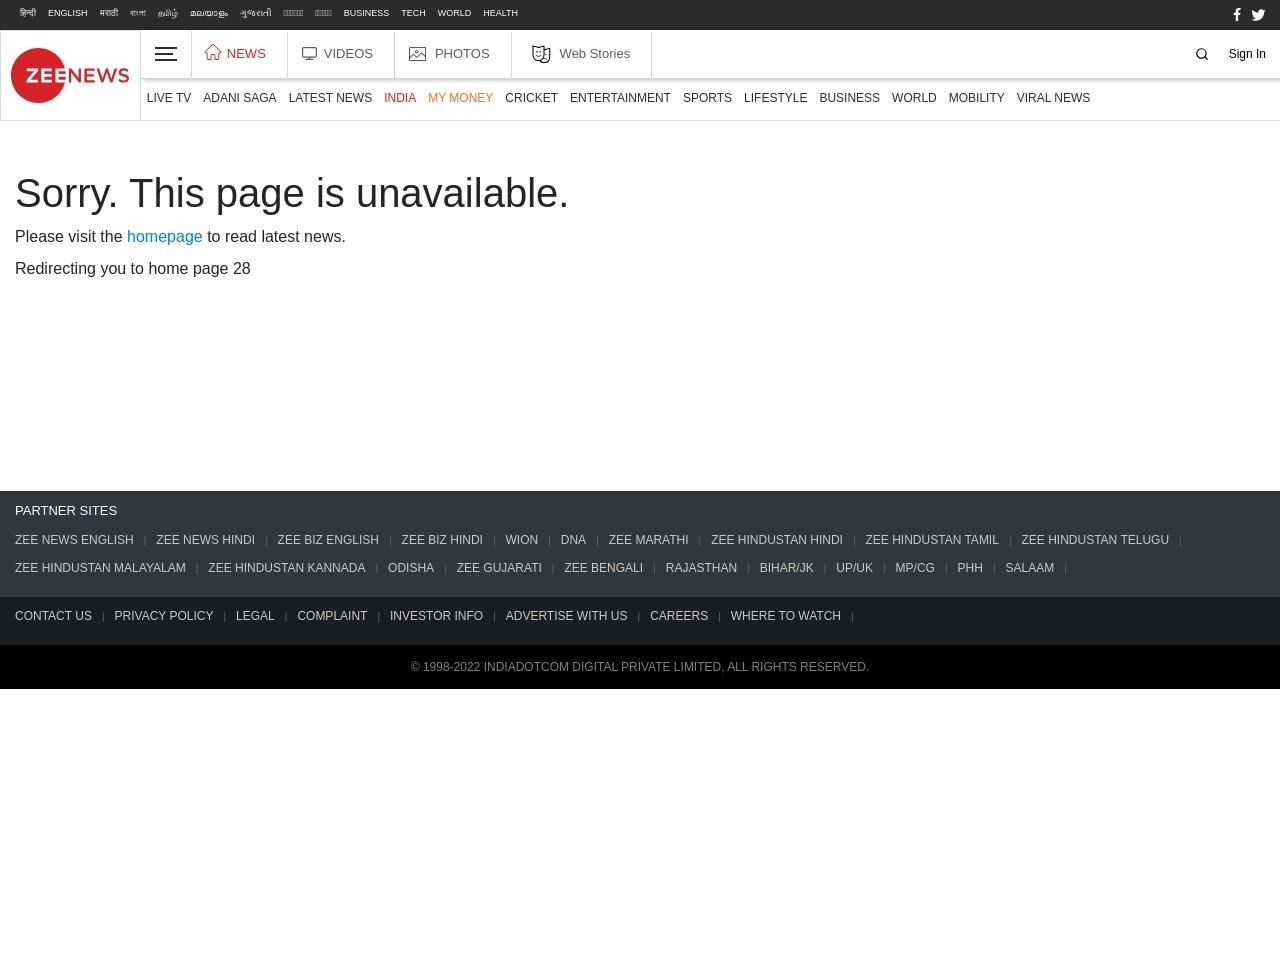 Rio Olympics 2016, Day 3: India's complete schedule; Abhinav Bindra, Gagan Narang in spotlight